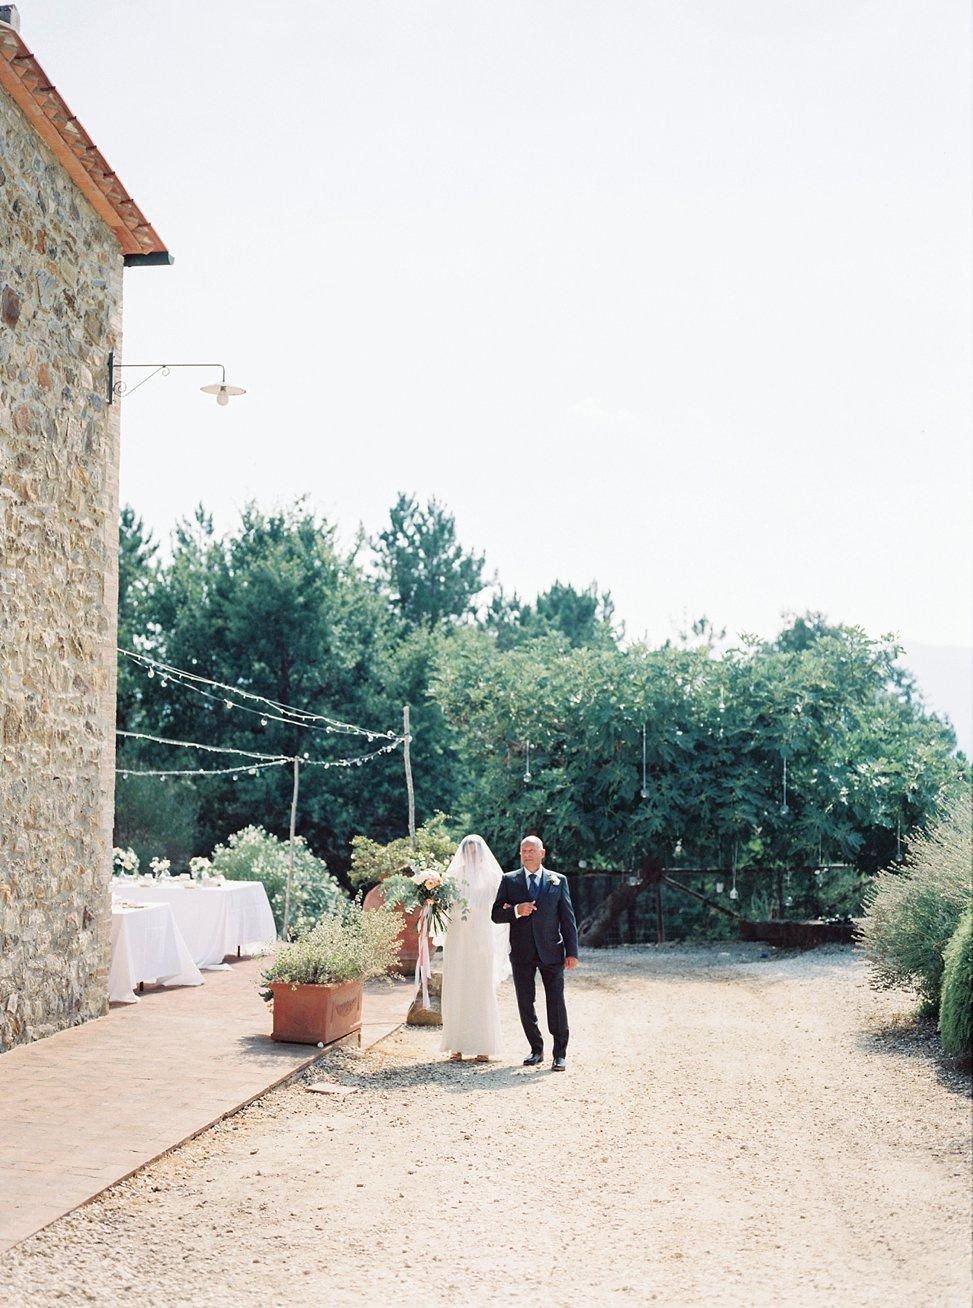 Amanda-Drost-Fotografie-Bruioft-Italie-Trouwen-buitenland-destination-wedding-italy_0098.jpg